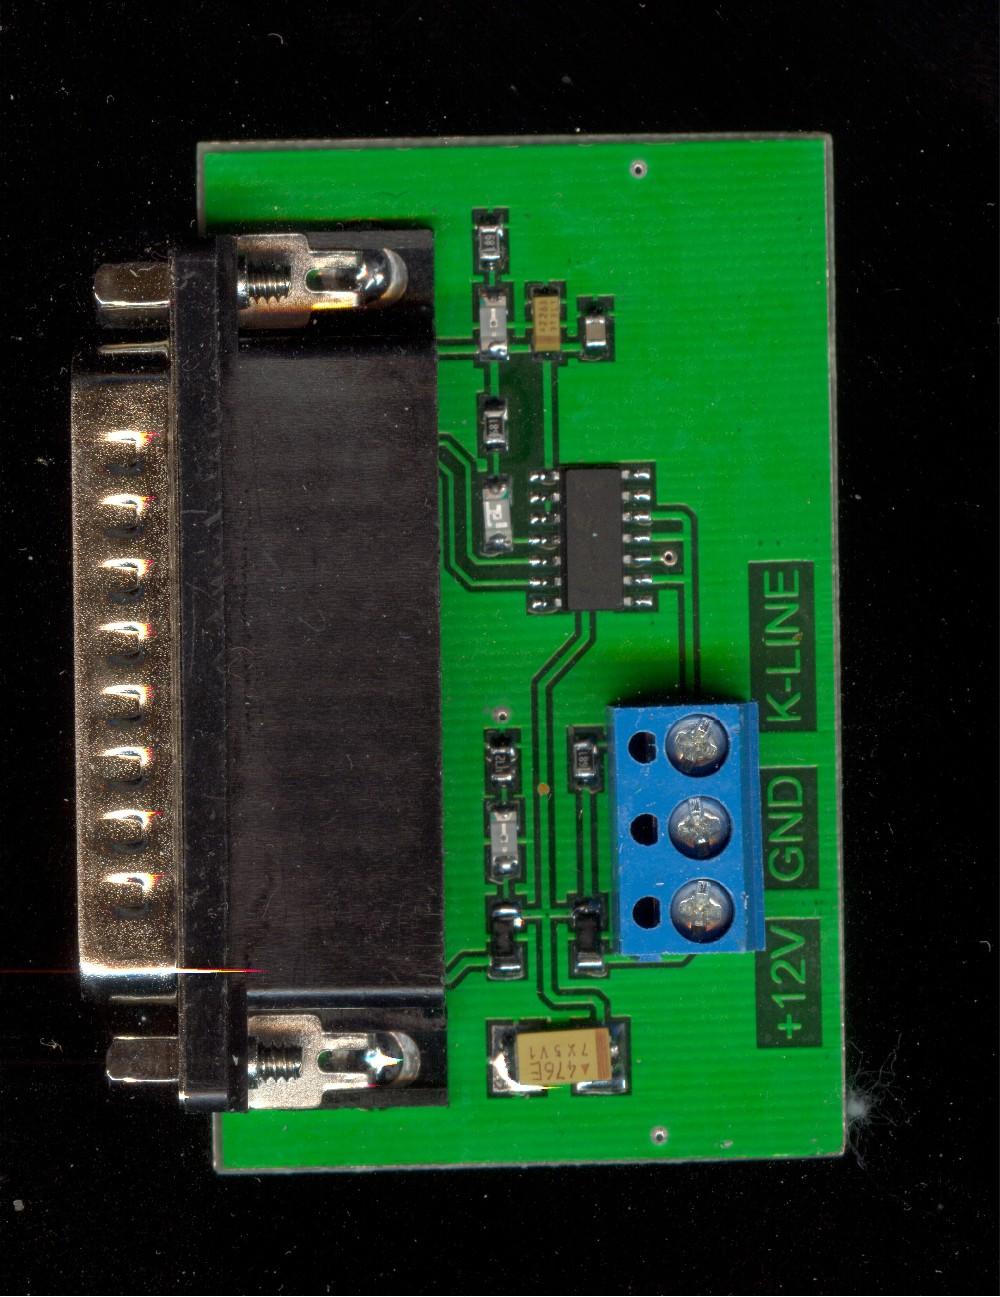 Obd galletto 1260 ecu chip tuning tool werkzeug obdii obd2 flasher - bild 3